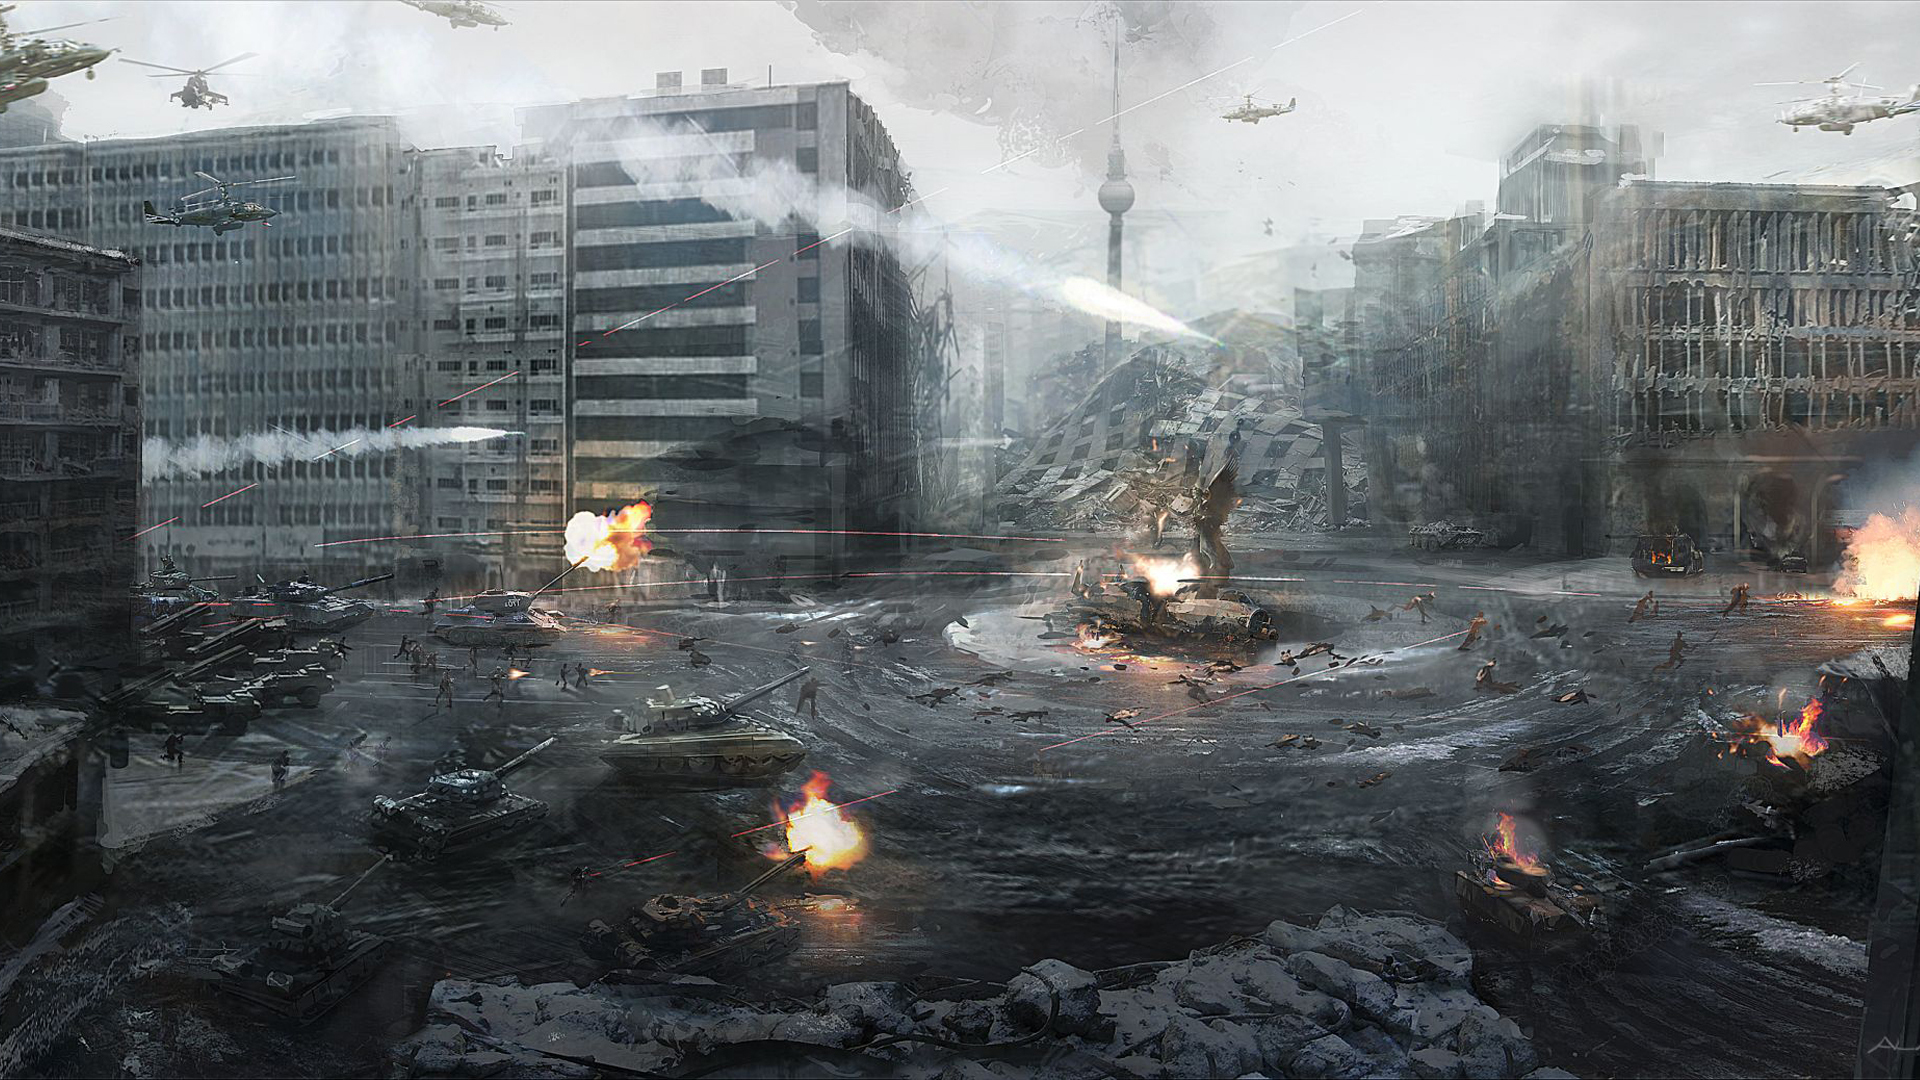 Image Call Of Duty Modern Warfare 3 City Wallpaper 1920x1080jpg